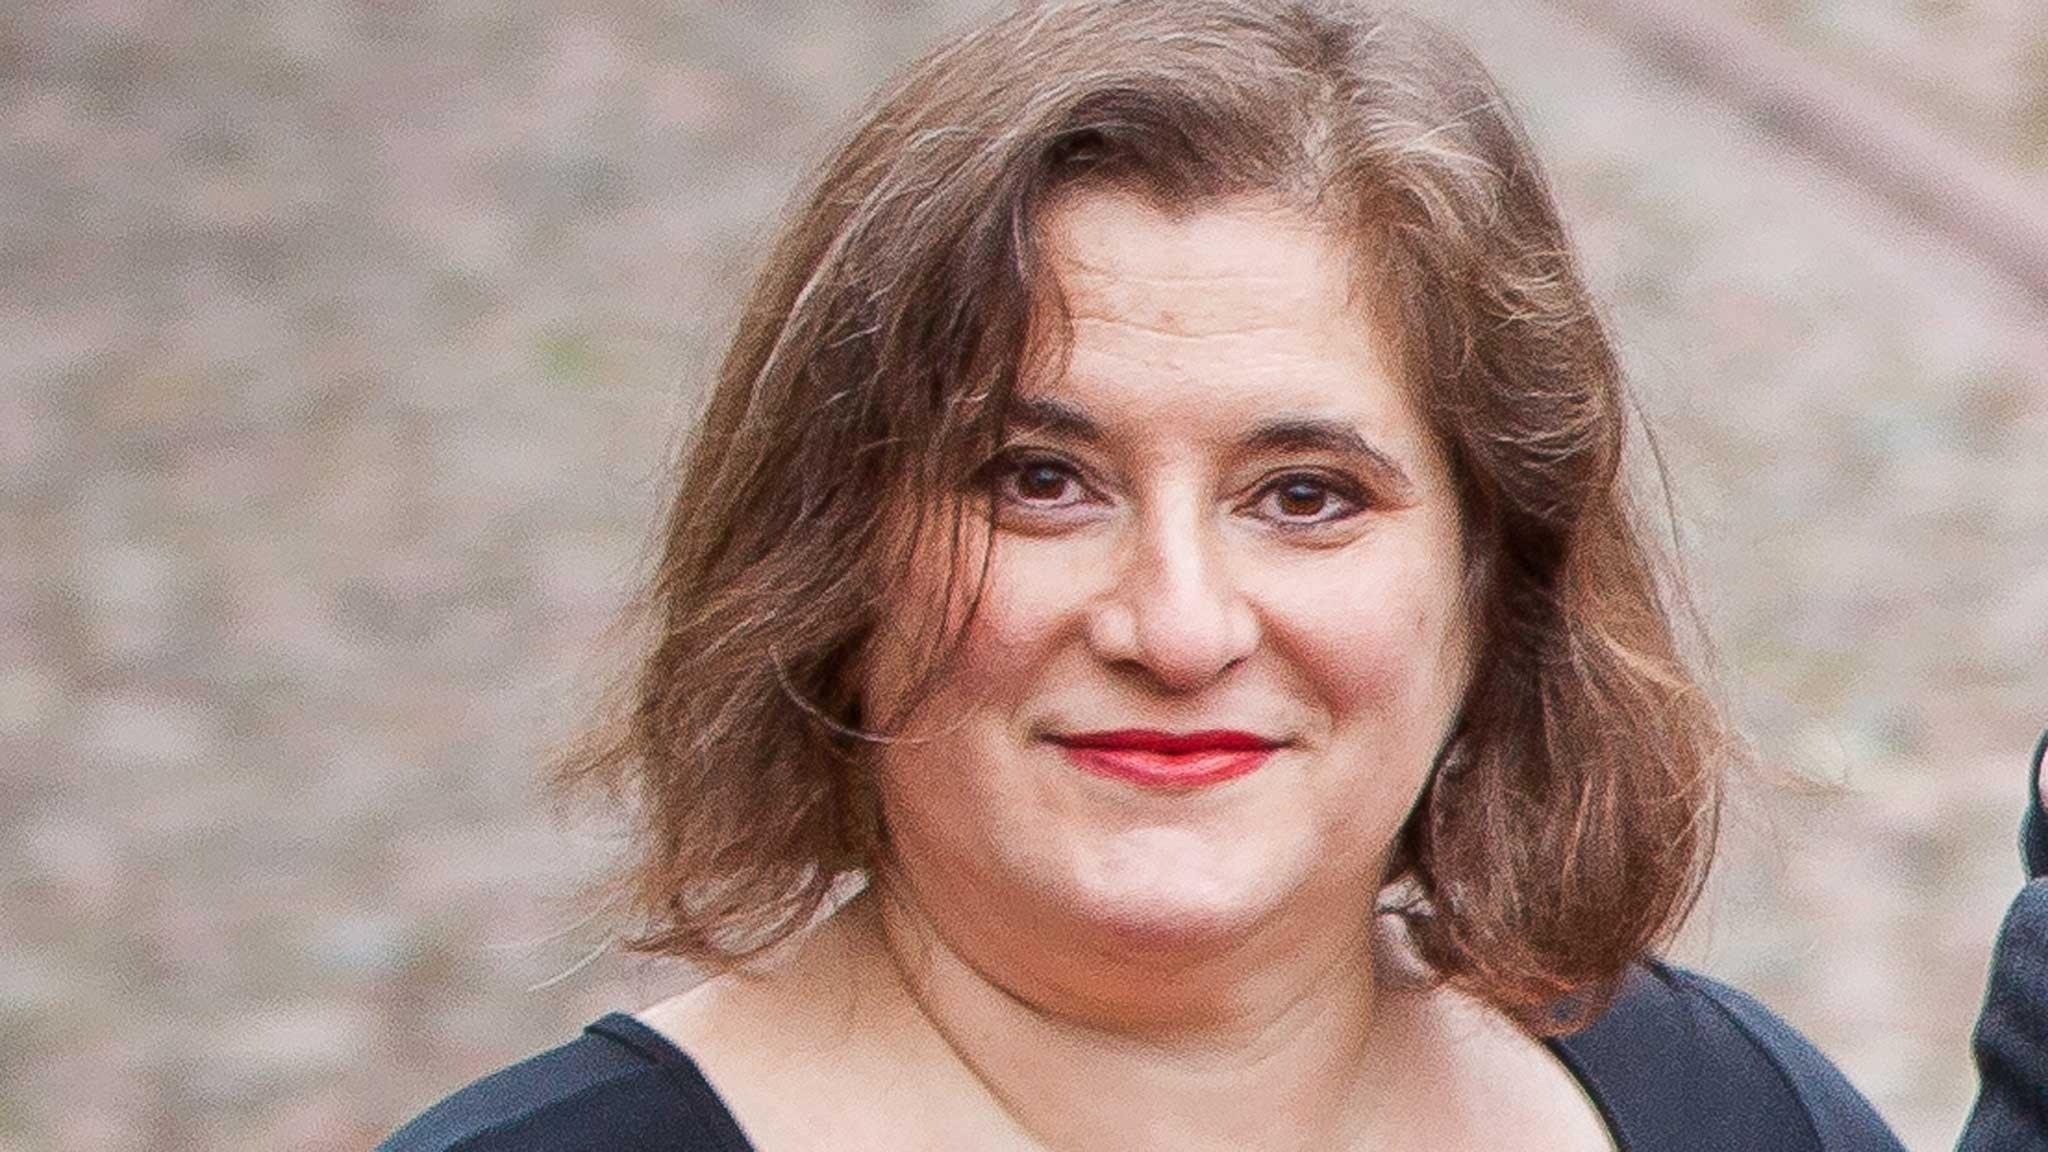 Anne Kalmering Josephson - Hejdå och hej.